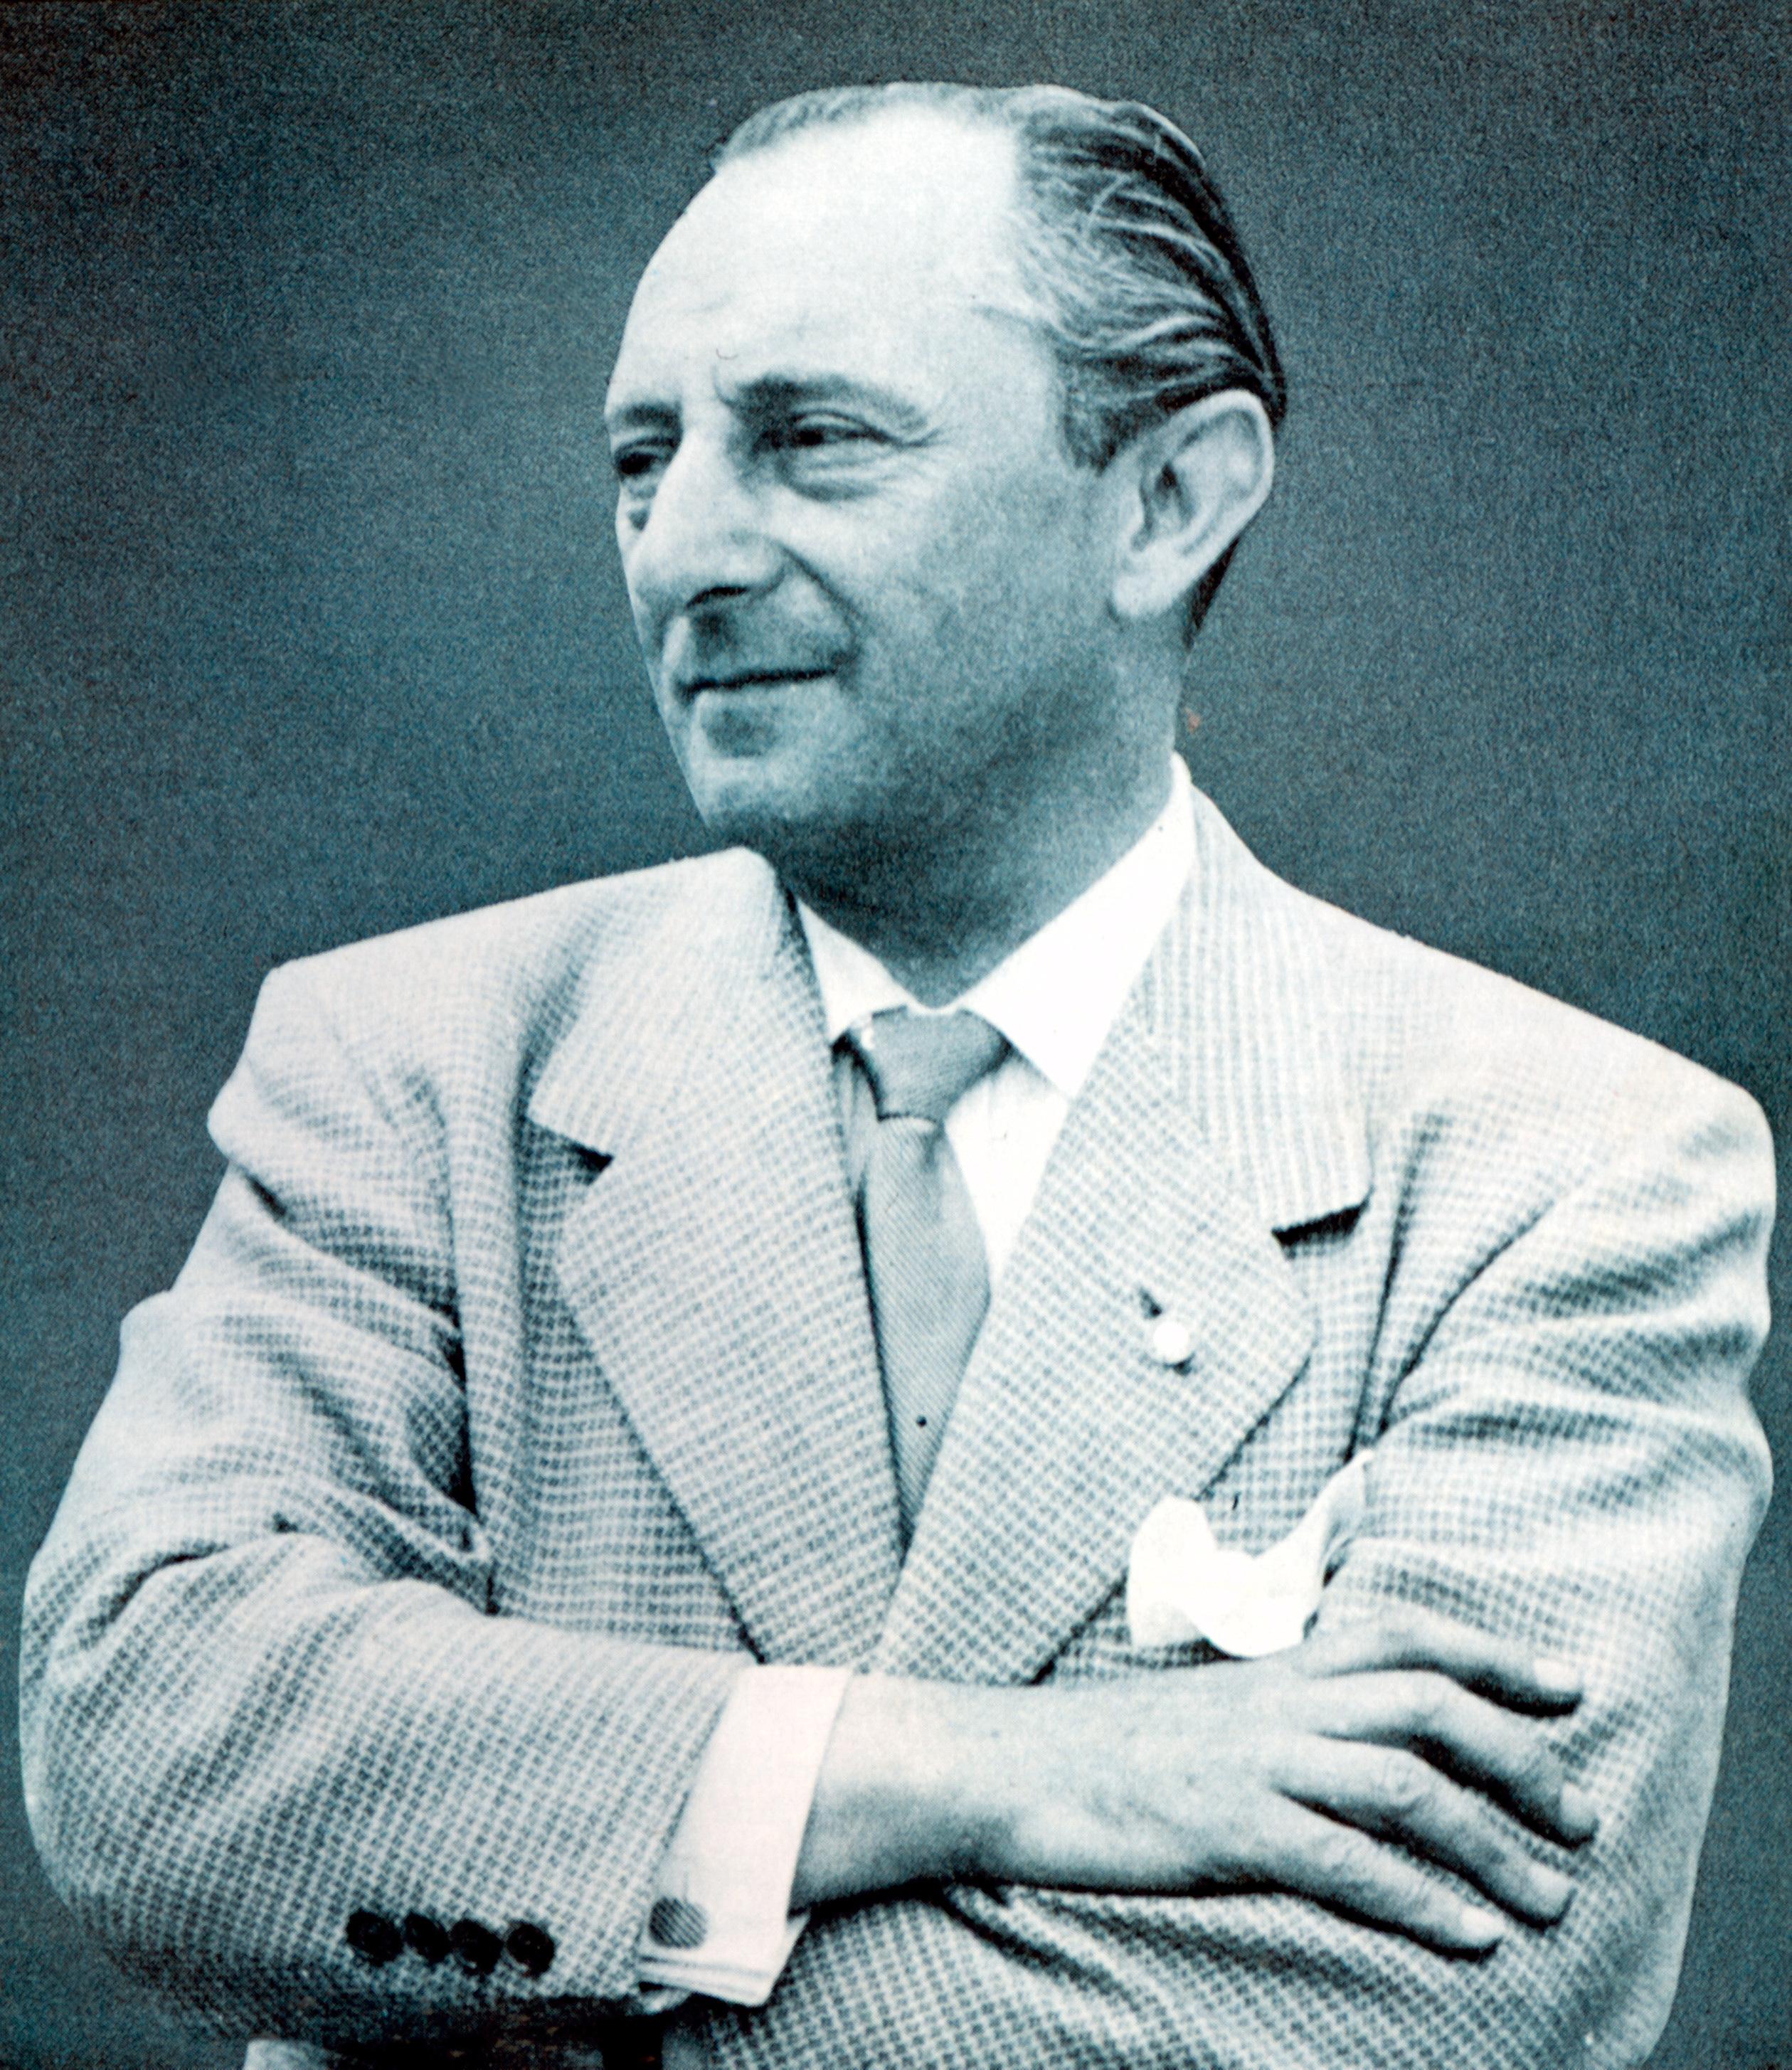 Max Hoffman portrait